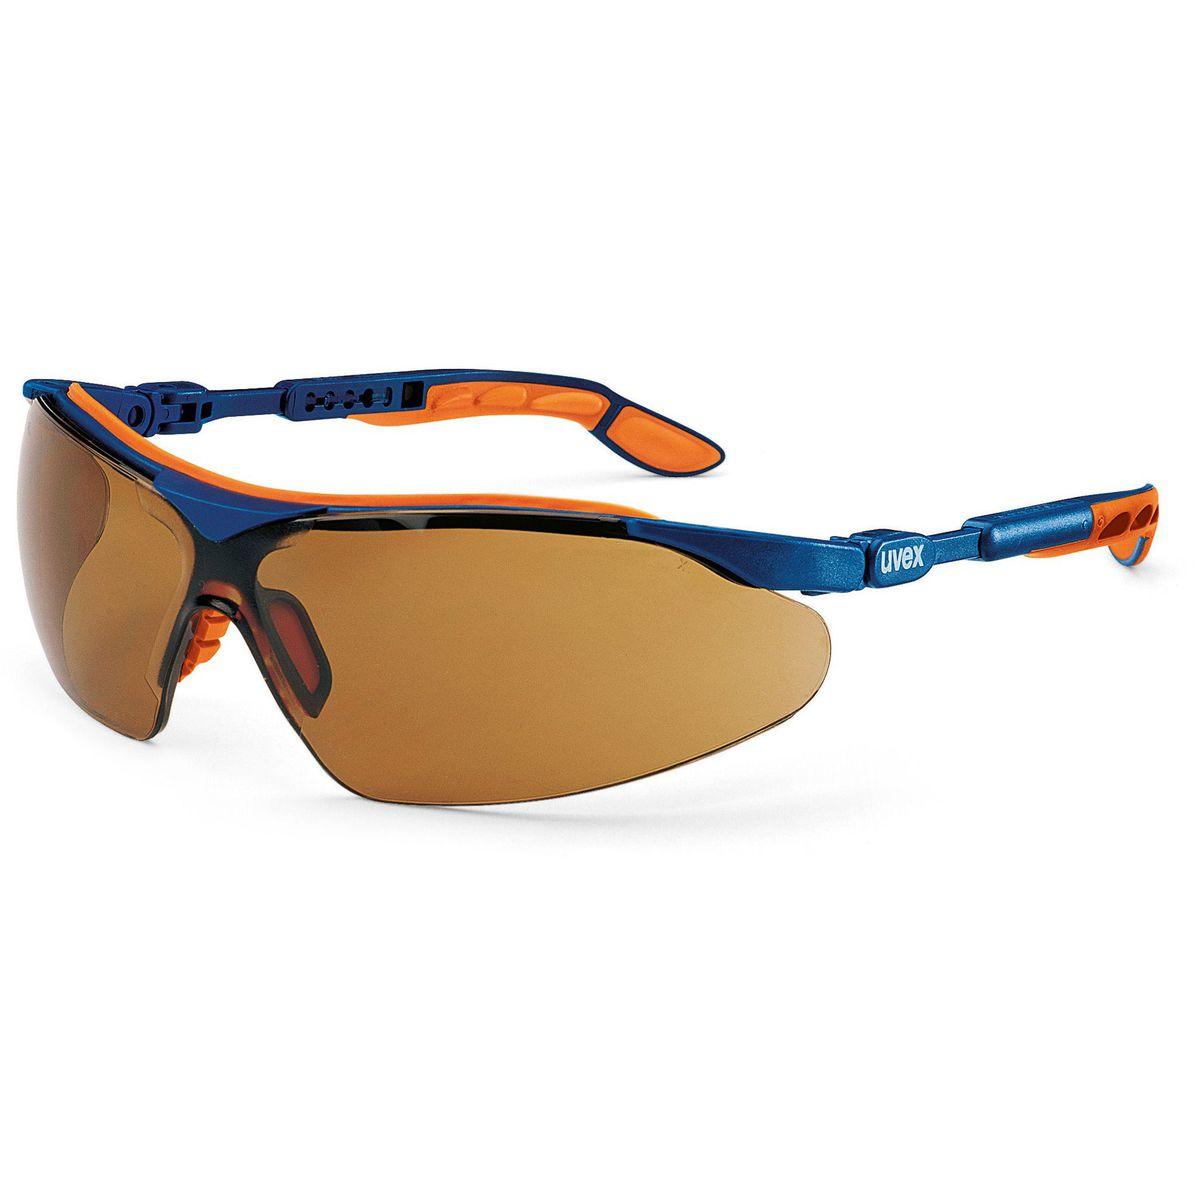 uvex i-vo Safety spectacles - Blue-Orange